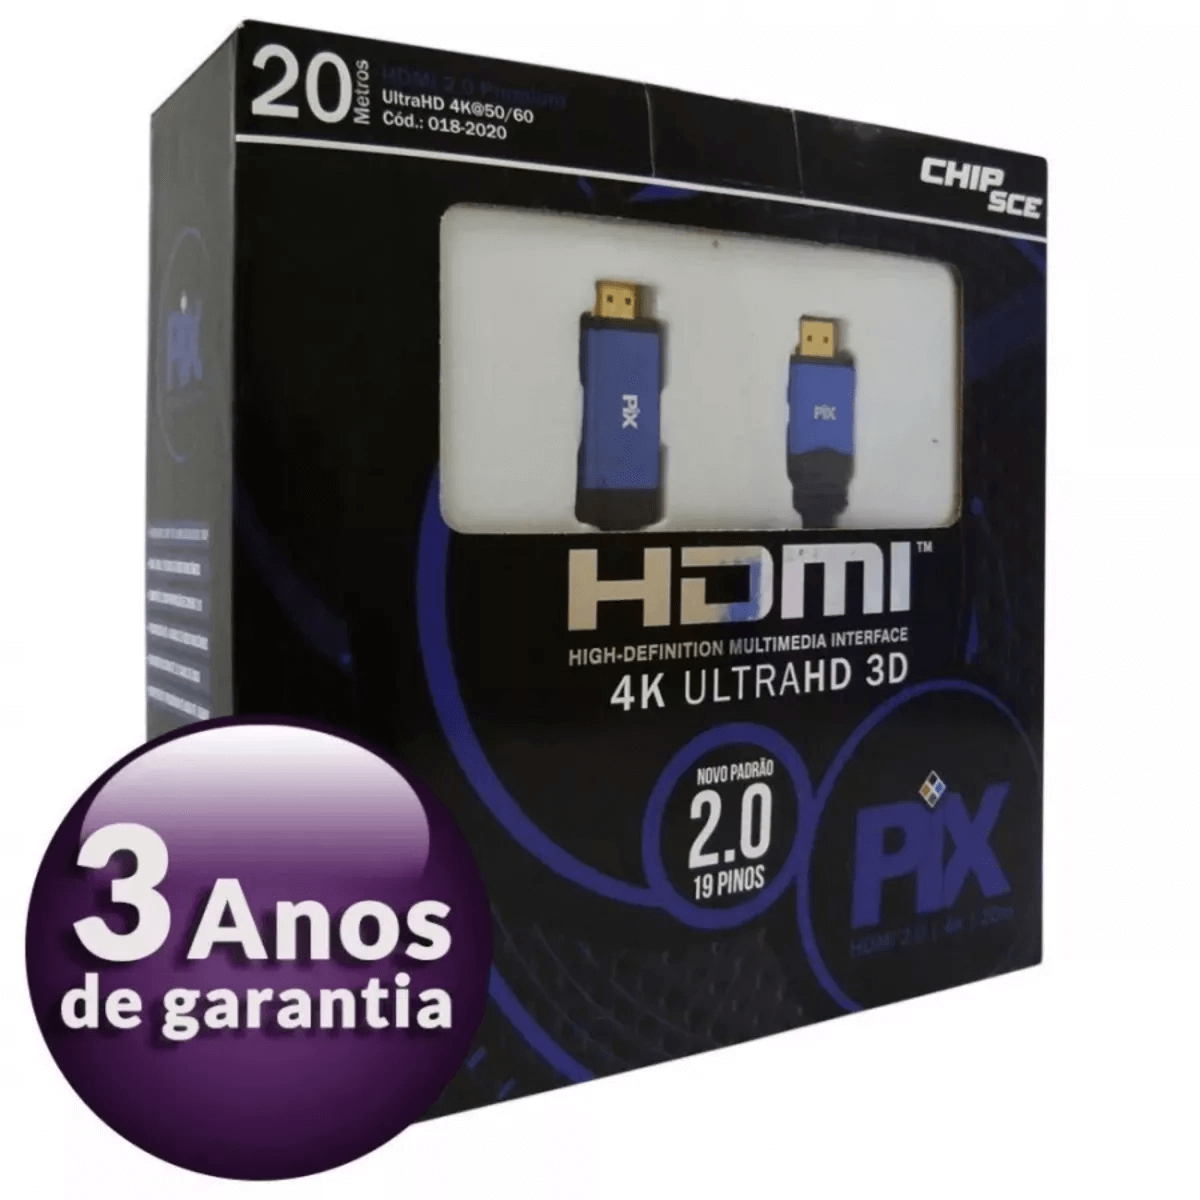 Cabo Hdmi 20m C/ Filtro 2.0 4k Ultra Hd 3d 19 Pinos 018-2020